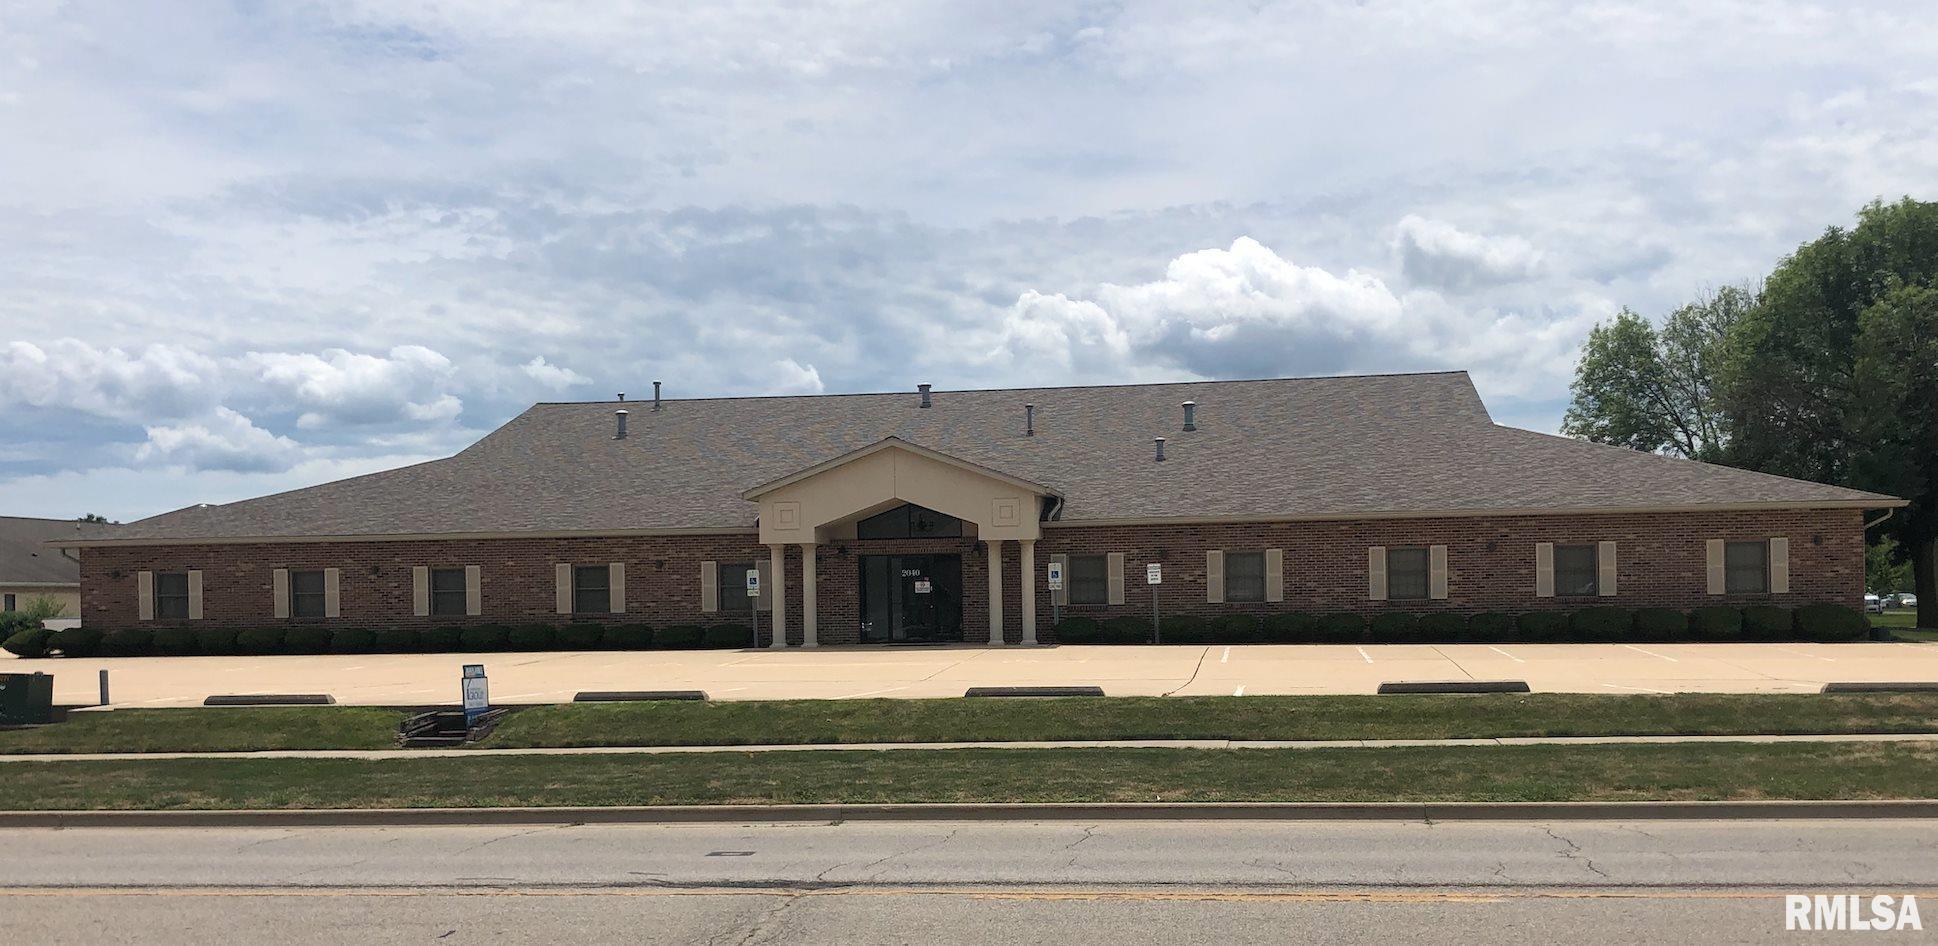 2040-2060 W Iles Property Photo - Springfield, IL real estate listing